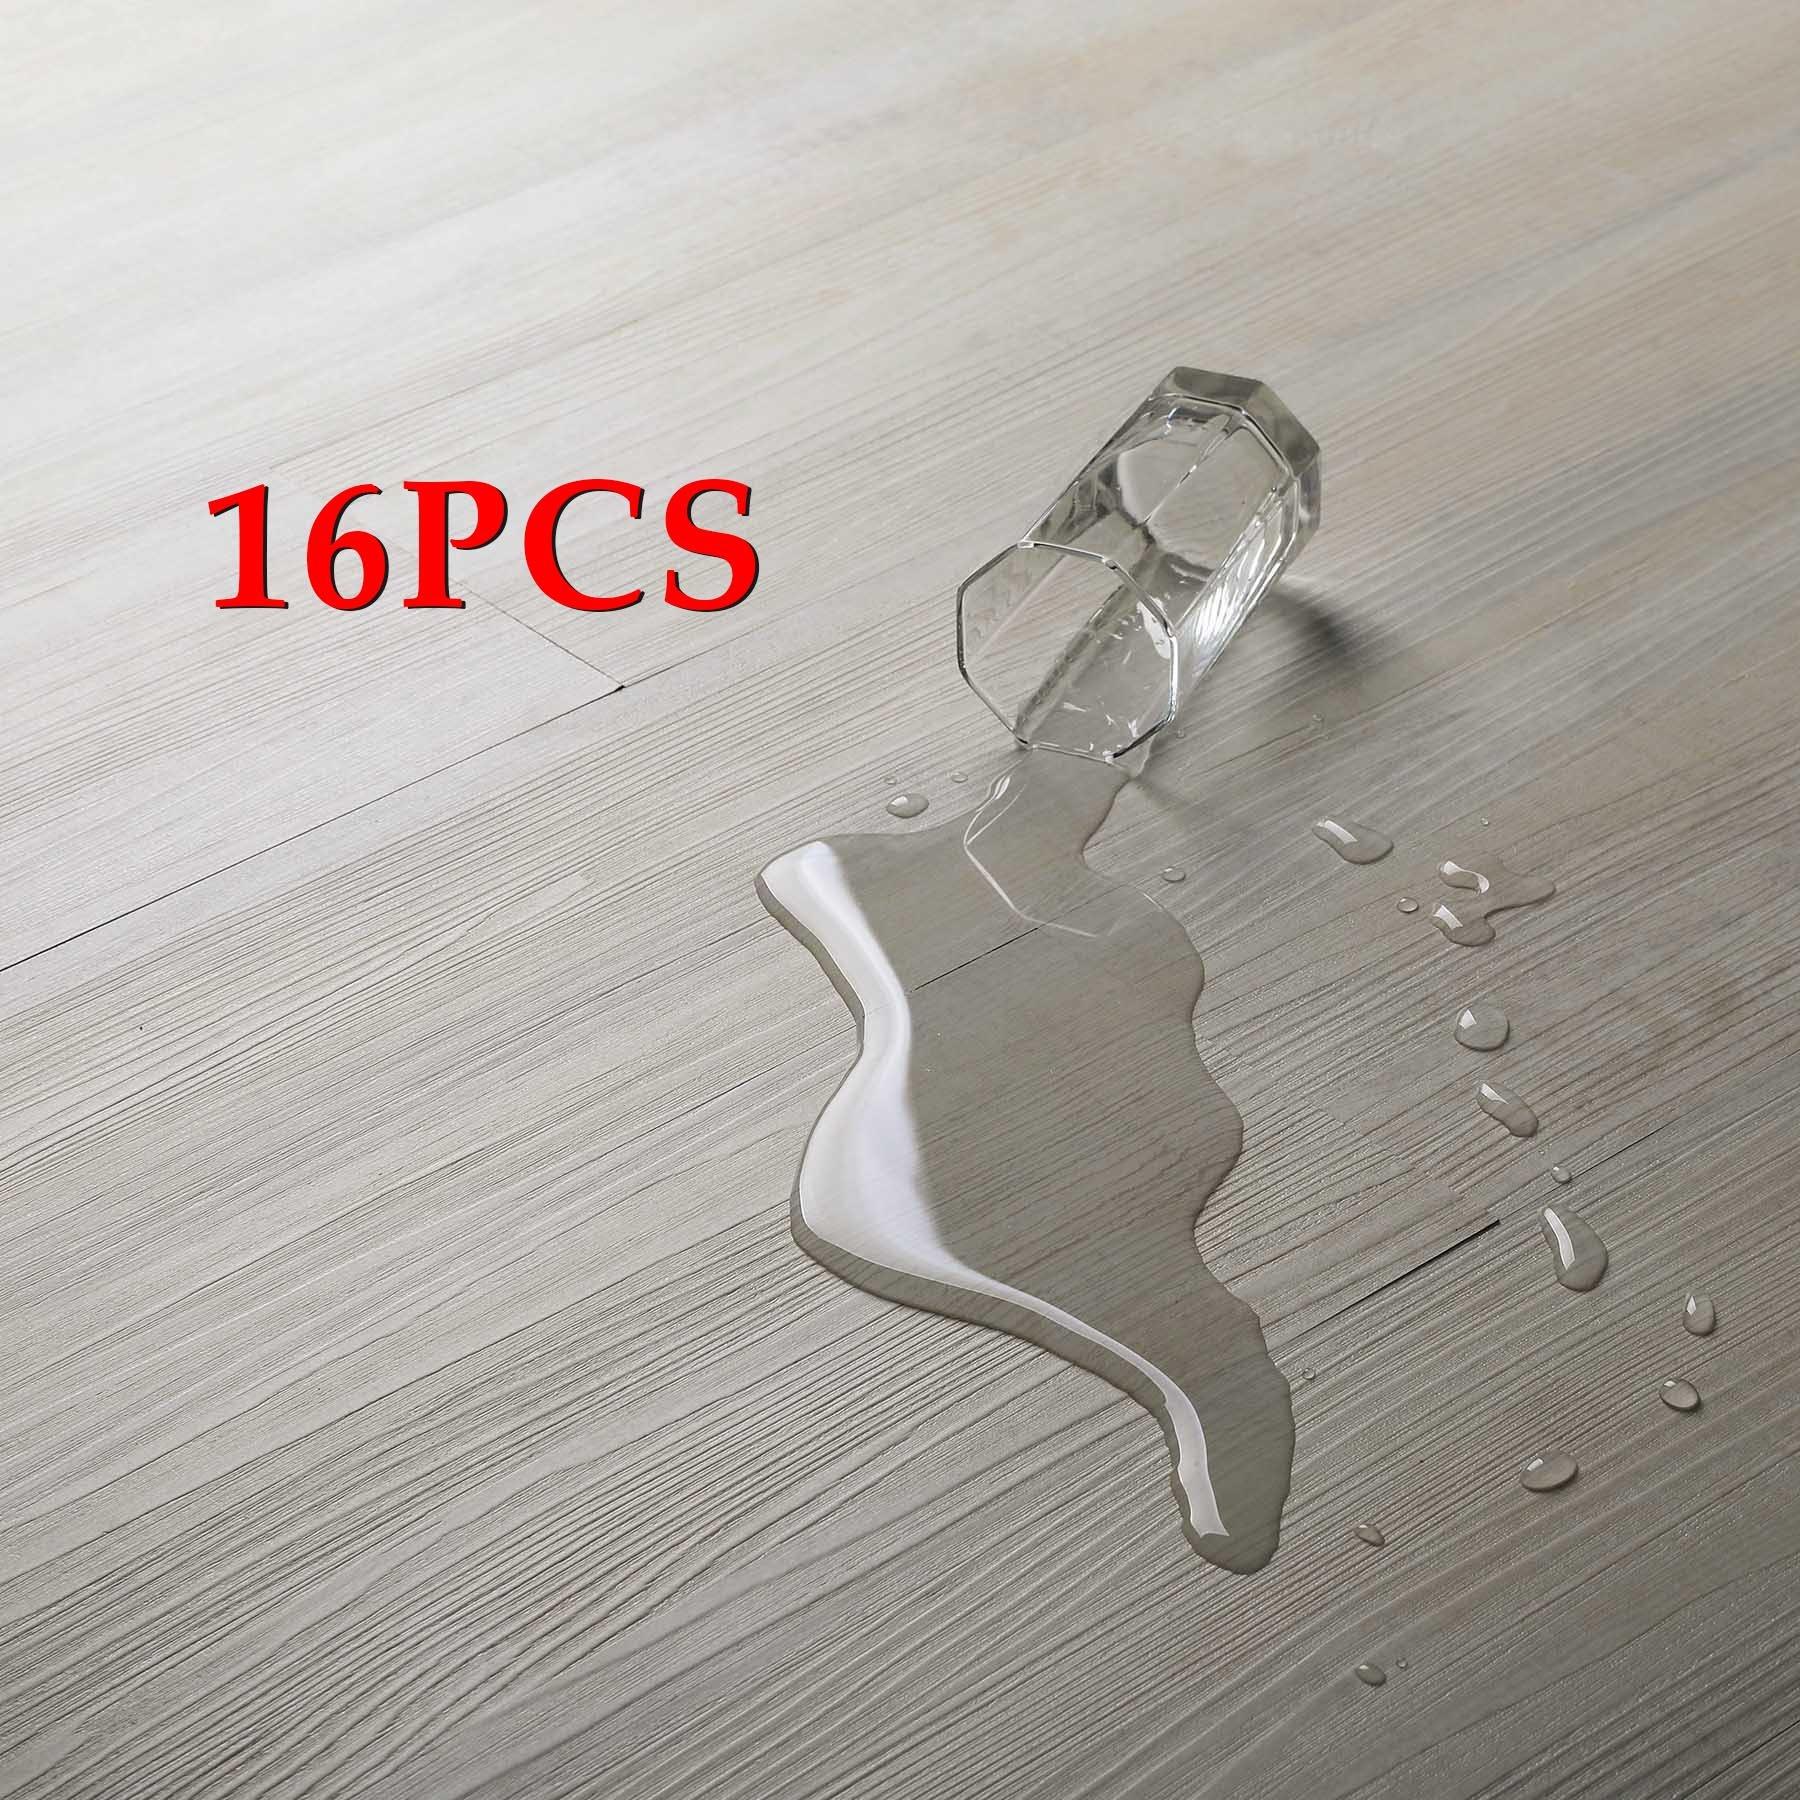 16 PCS/24 Square Feet, CO-Z Odorless Vinyl Floor Planks Adhesive Floor Tiles 2.0mm Thick, Environmental-Friendly (Beige)